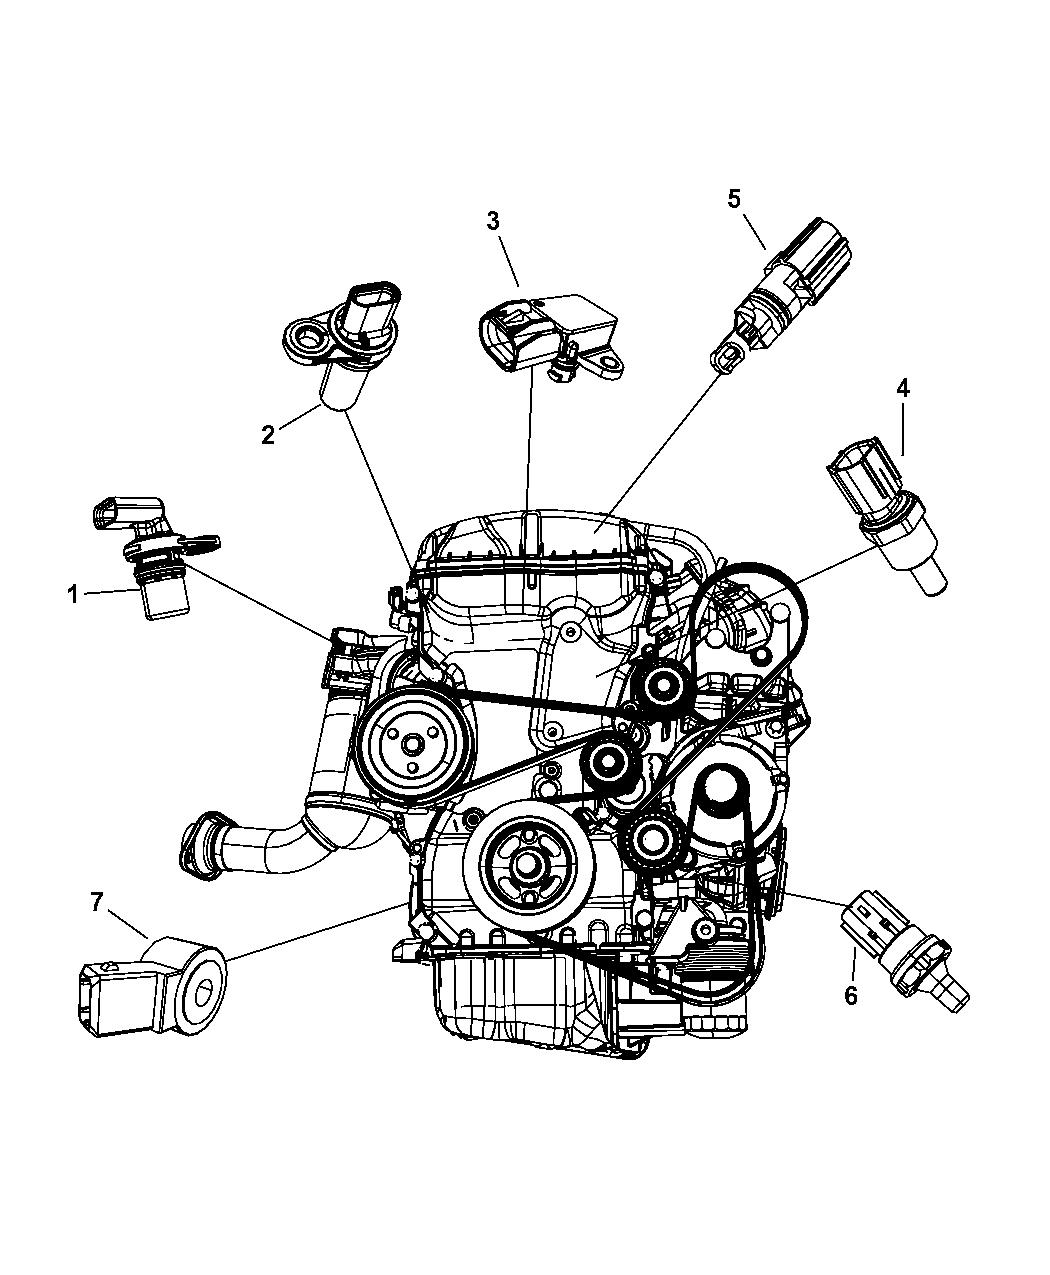 2008 dodge avenger sensors engine mopar parts giant rh moparpartsgiant com 2008 dodge avenger 2.4 engine diagram